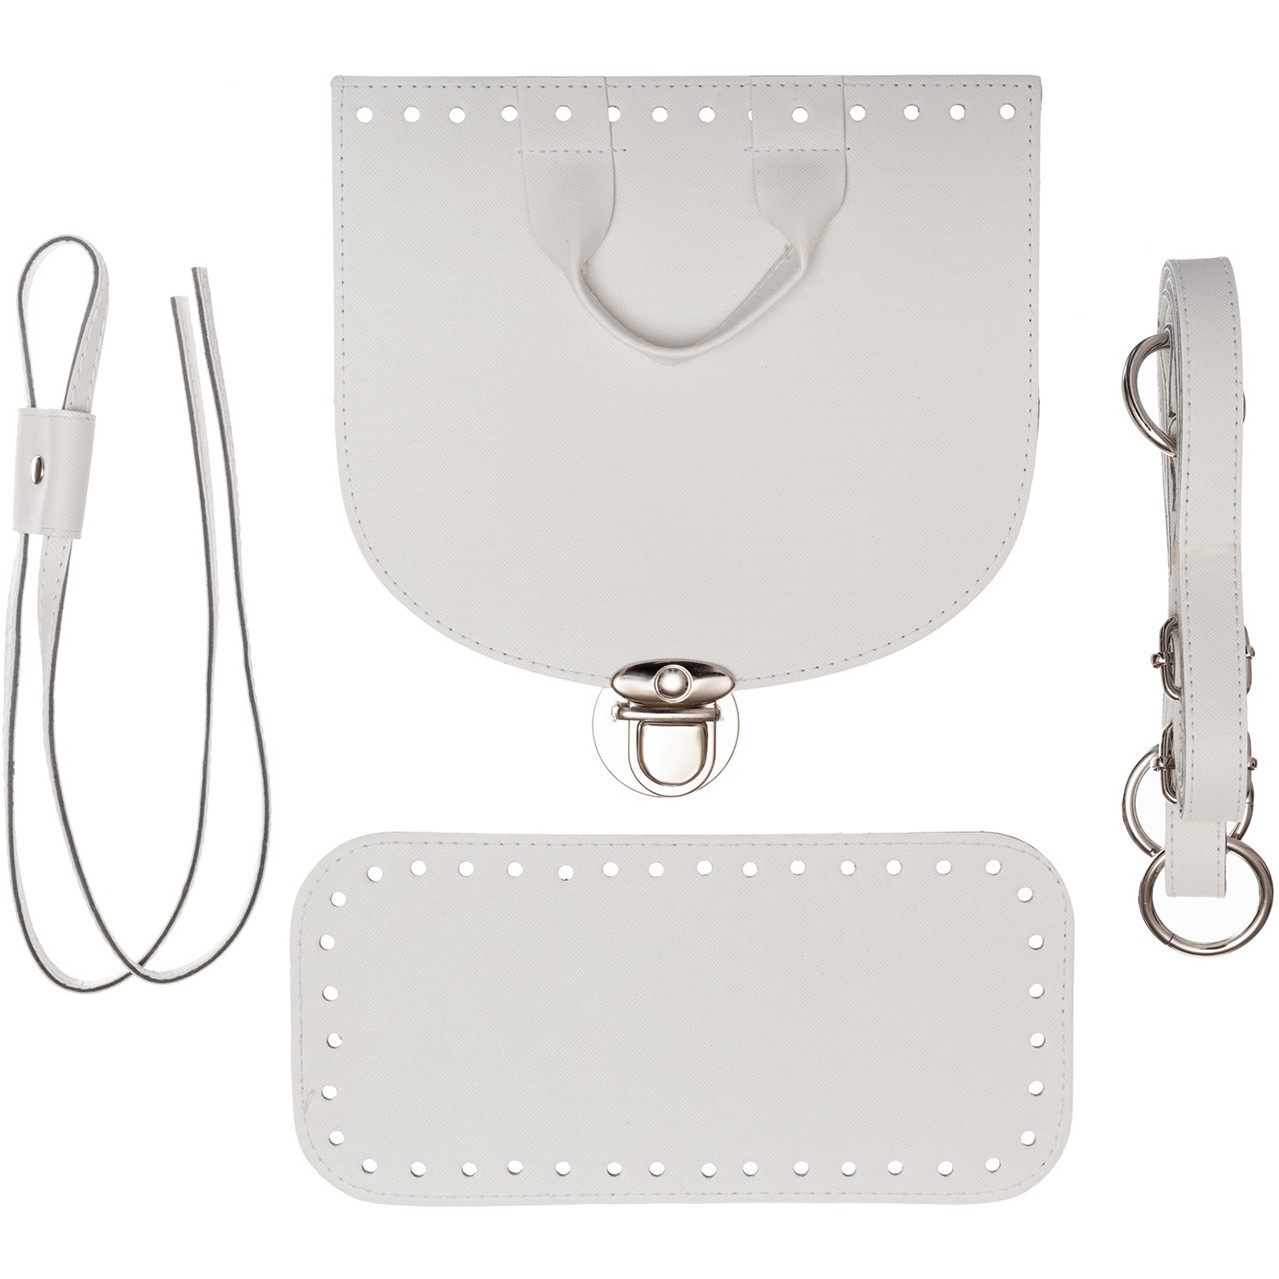 Набор для рюкзака экокожа Белый (5 позиций) фурнитура серебро